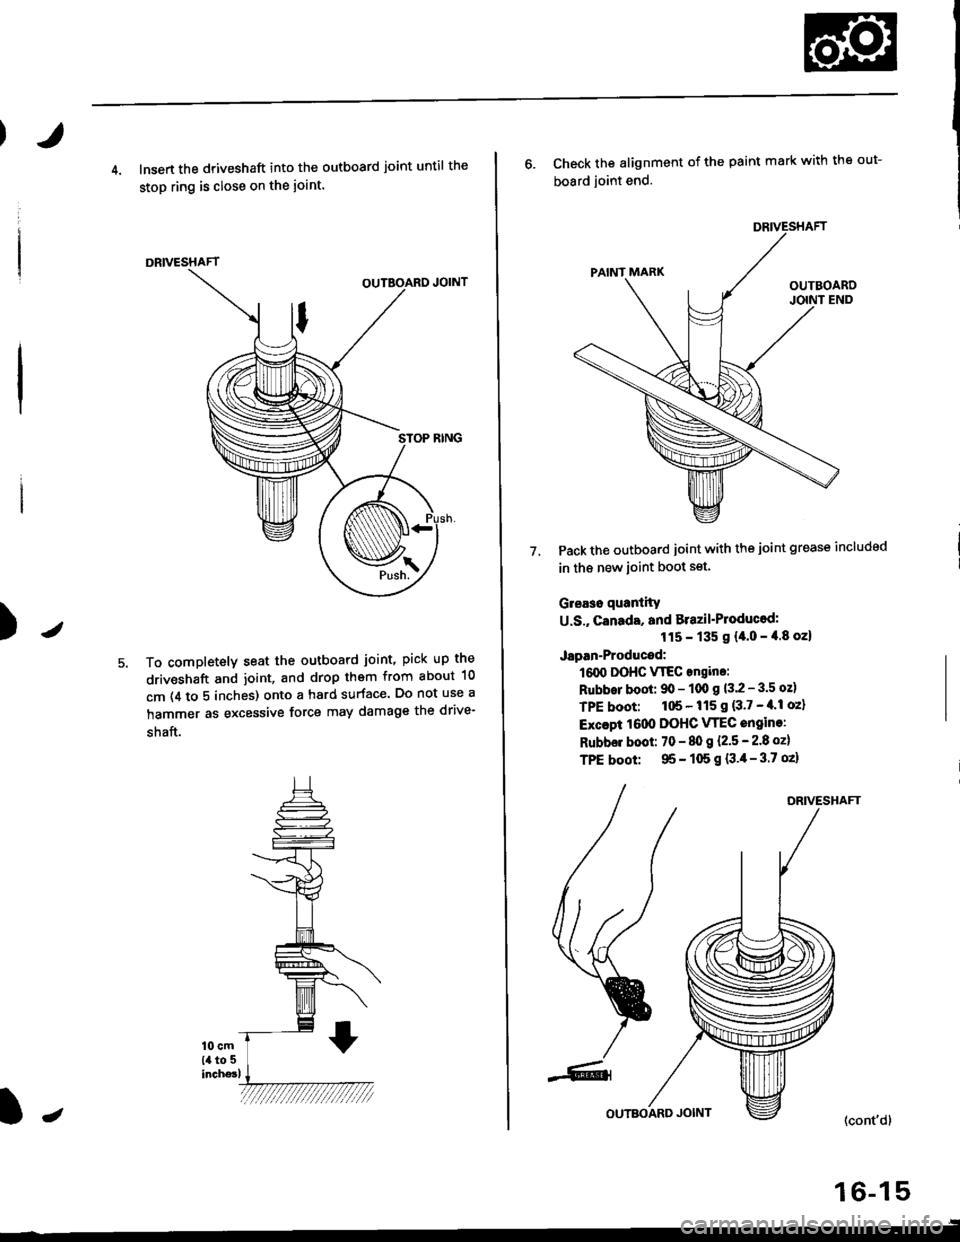 medium resolution of 93 geo tracker engine hoses diagram diagram data schema 93 geo tracker engine hoses diagram